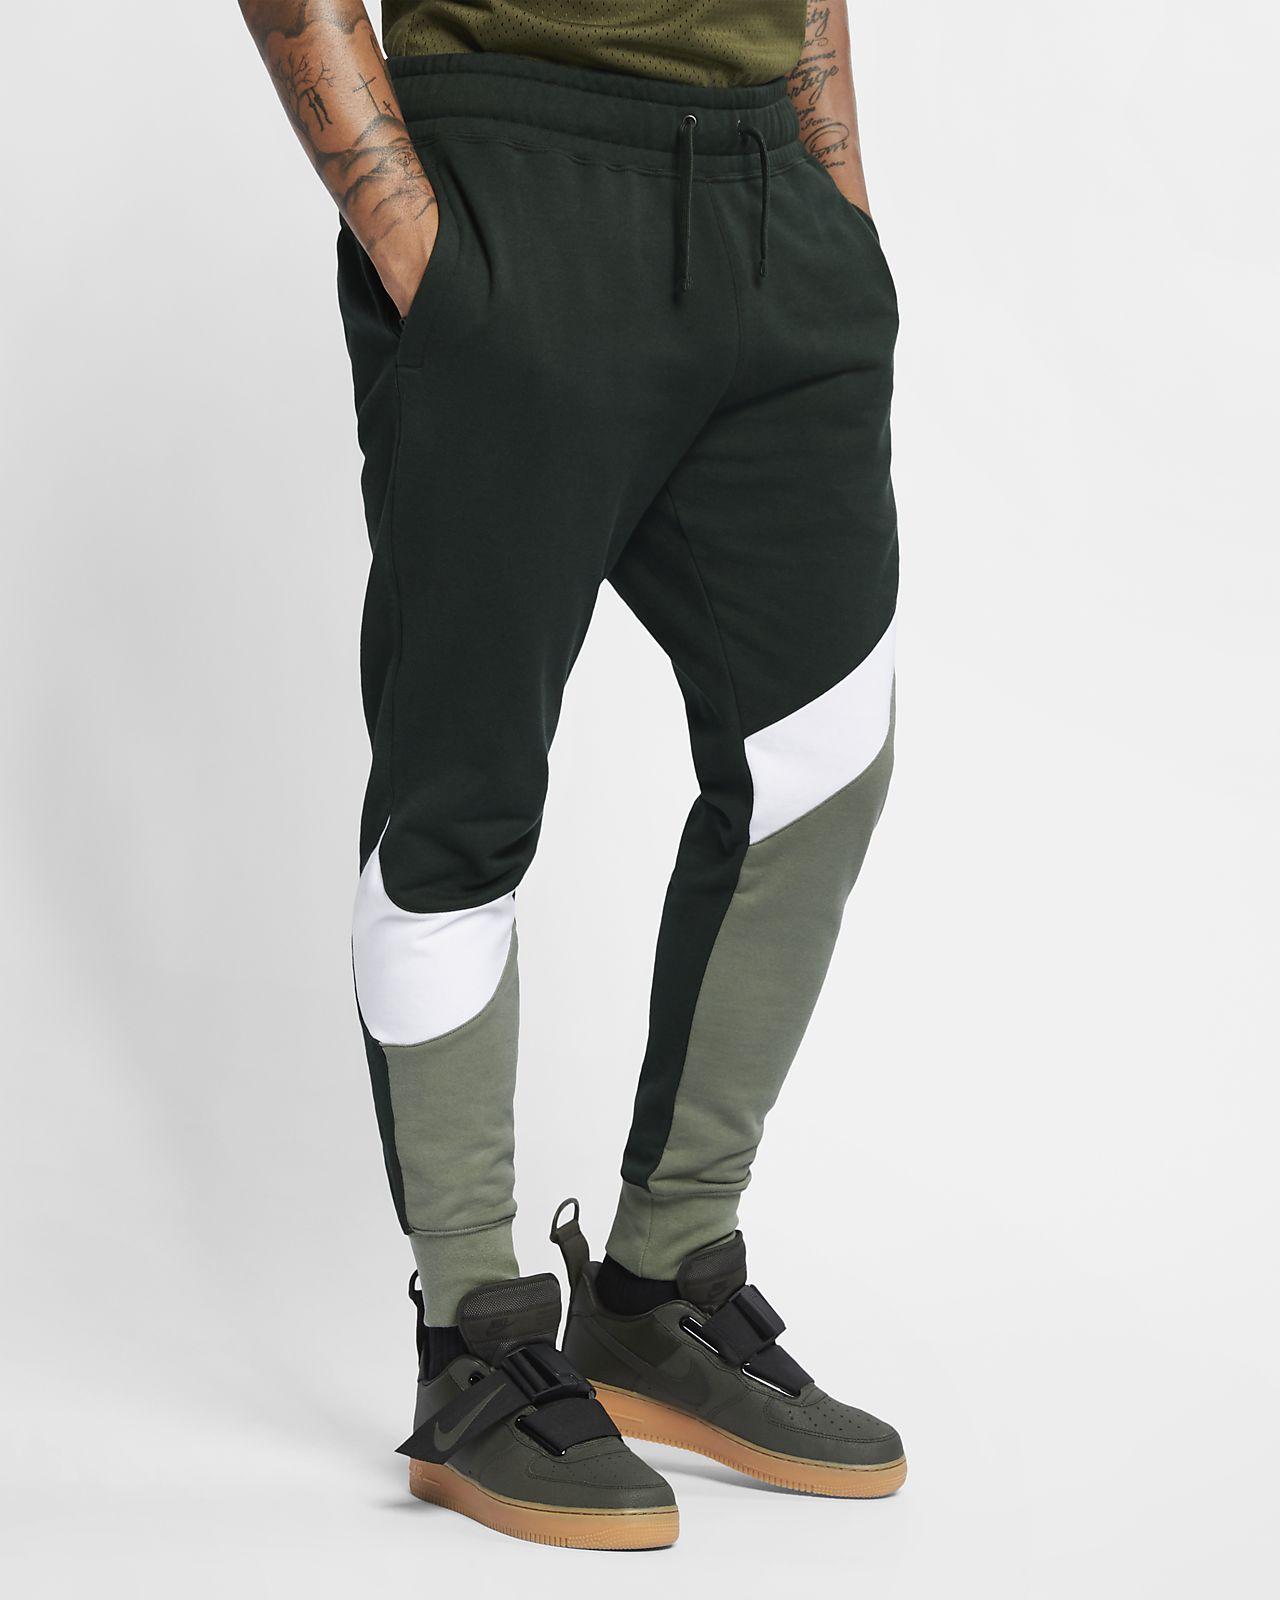 Nike Sportswear bukse til herre